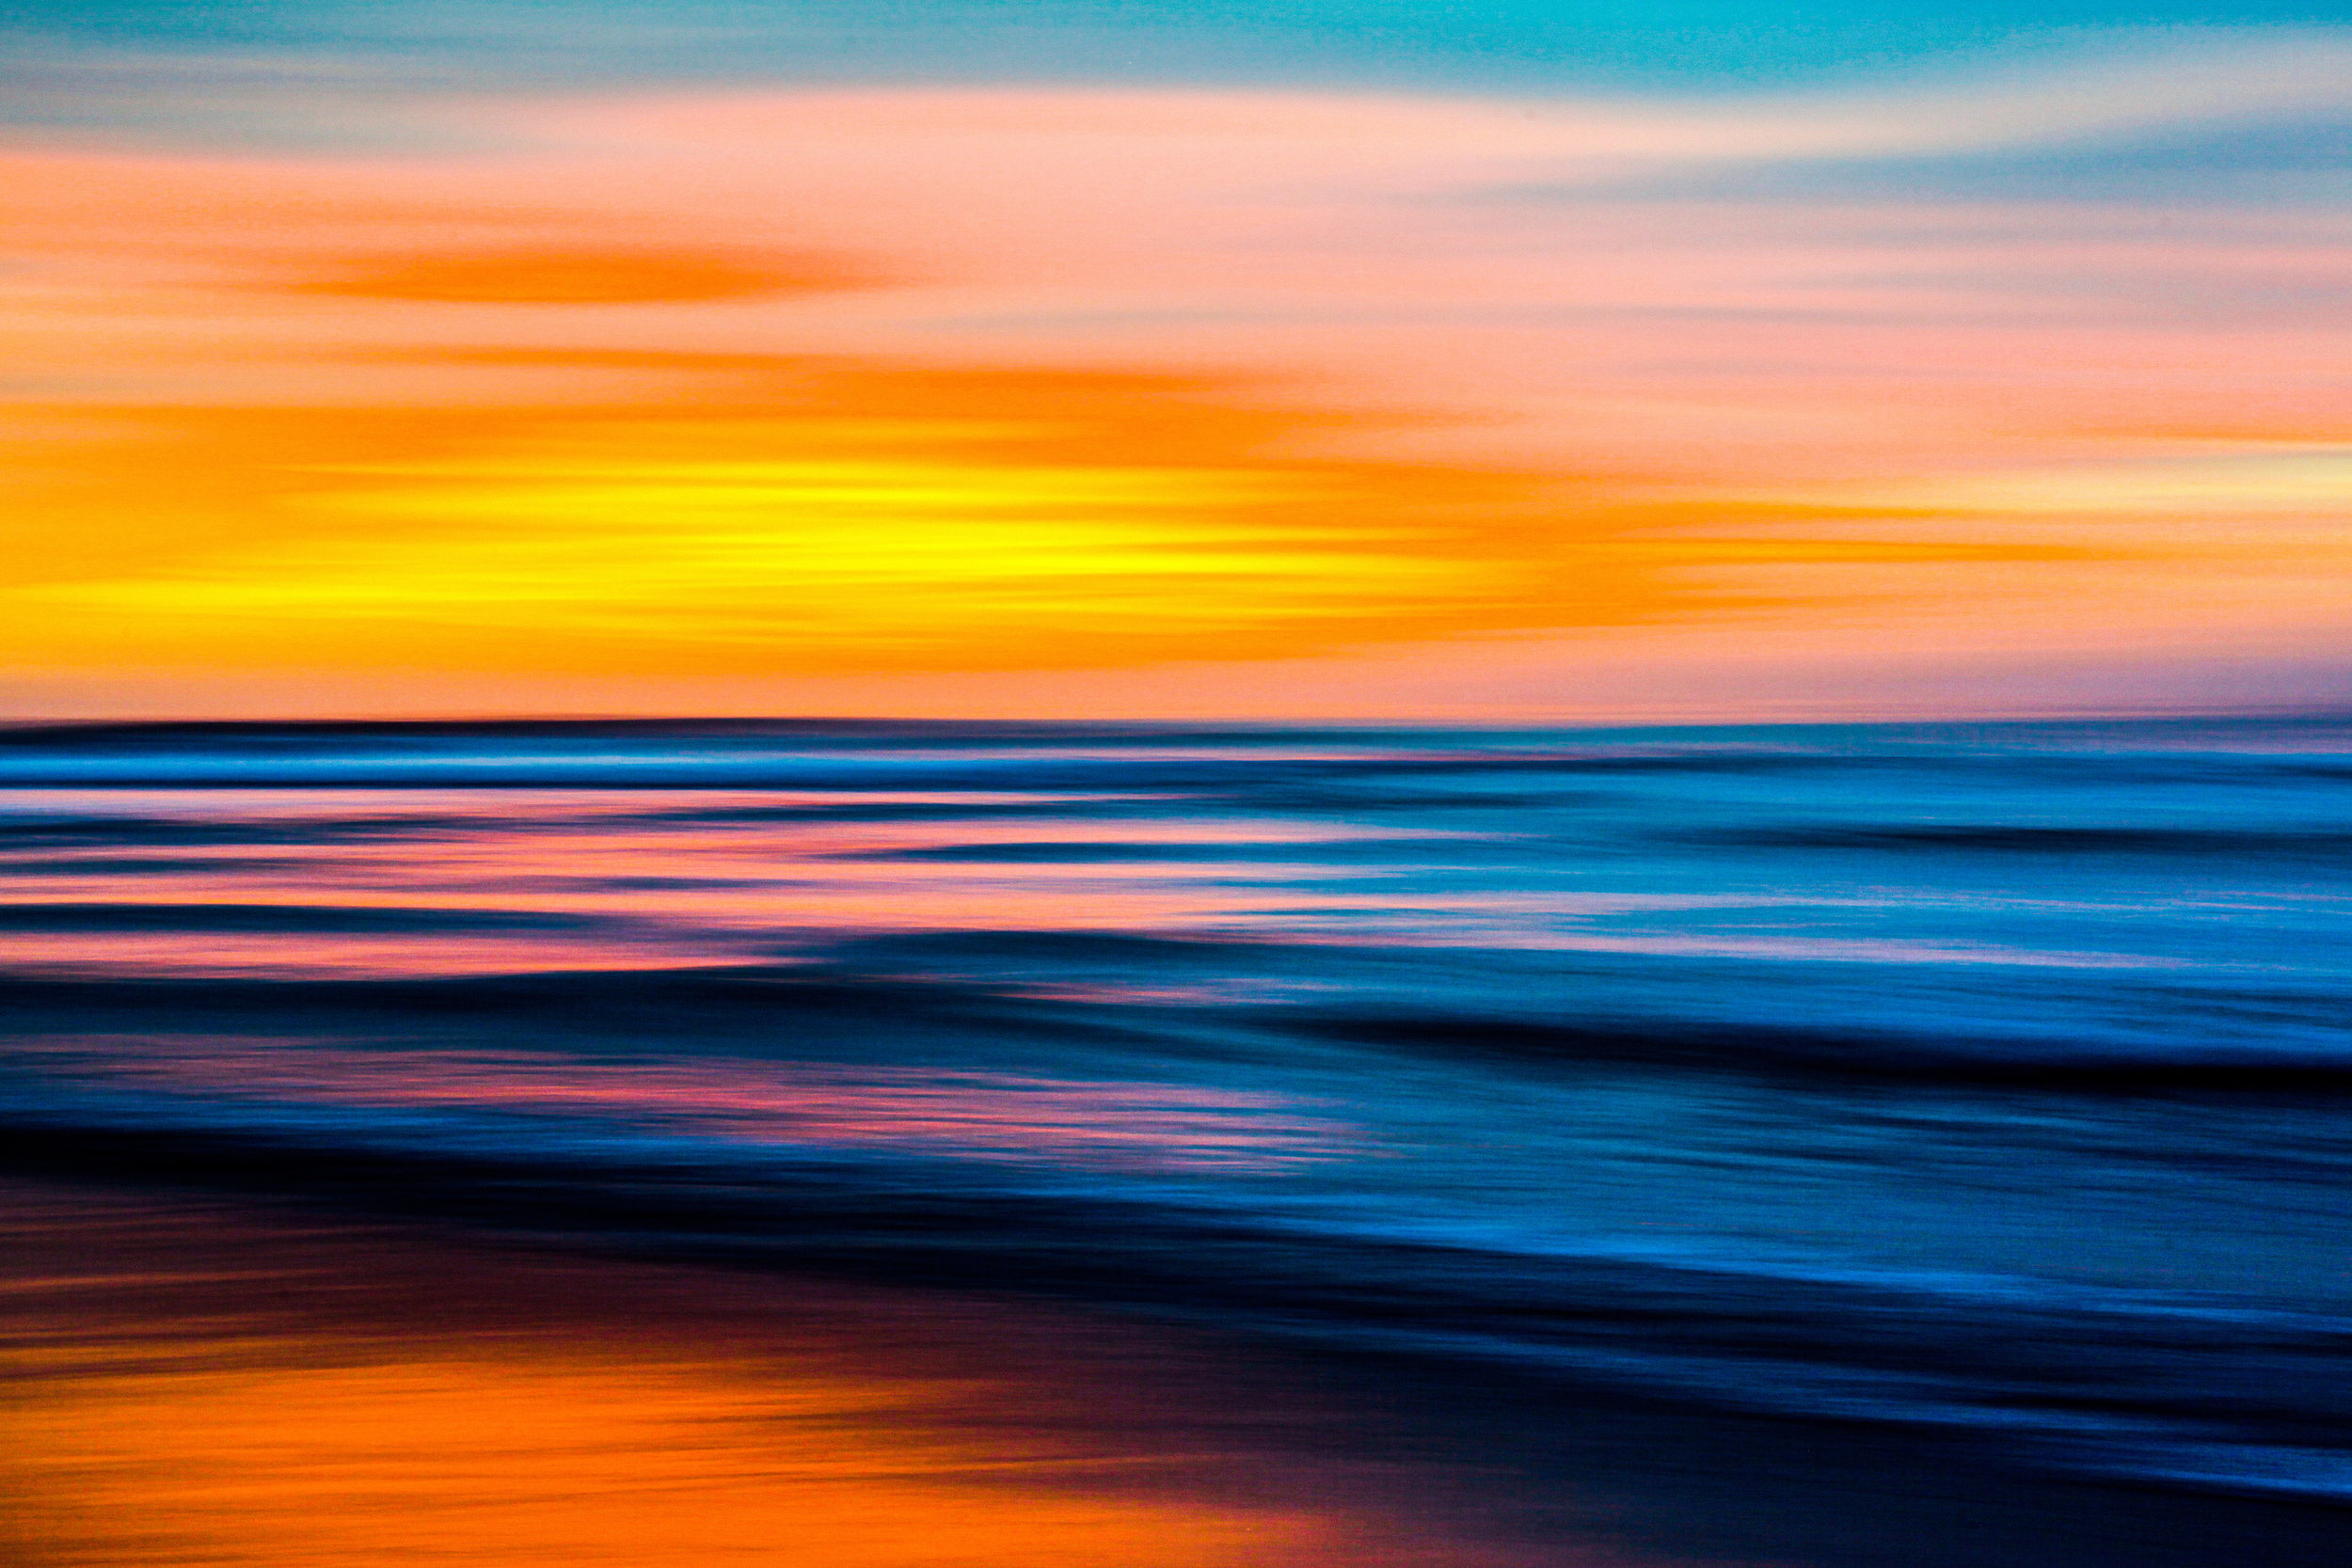 Surf_Art_01.jpg